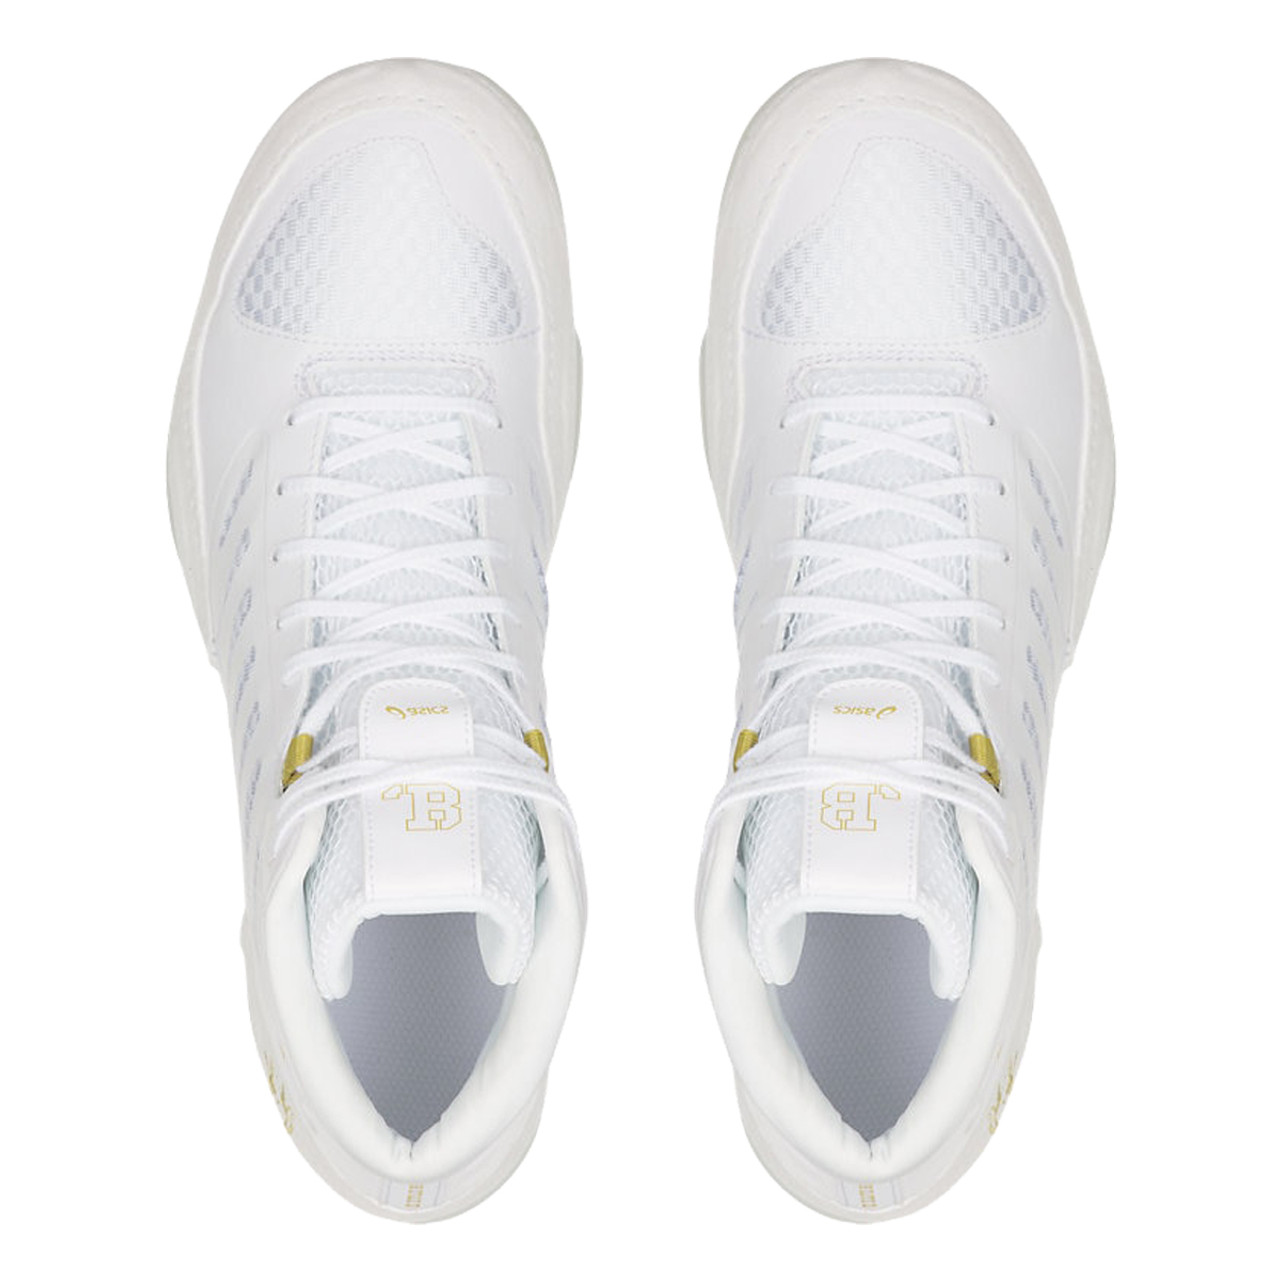 26da0d48aaa2 ... free shipping asics jb elite iii mens wrestling shoes white a661b c4ebc